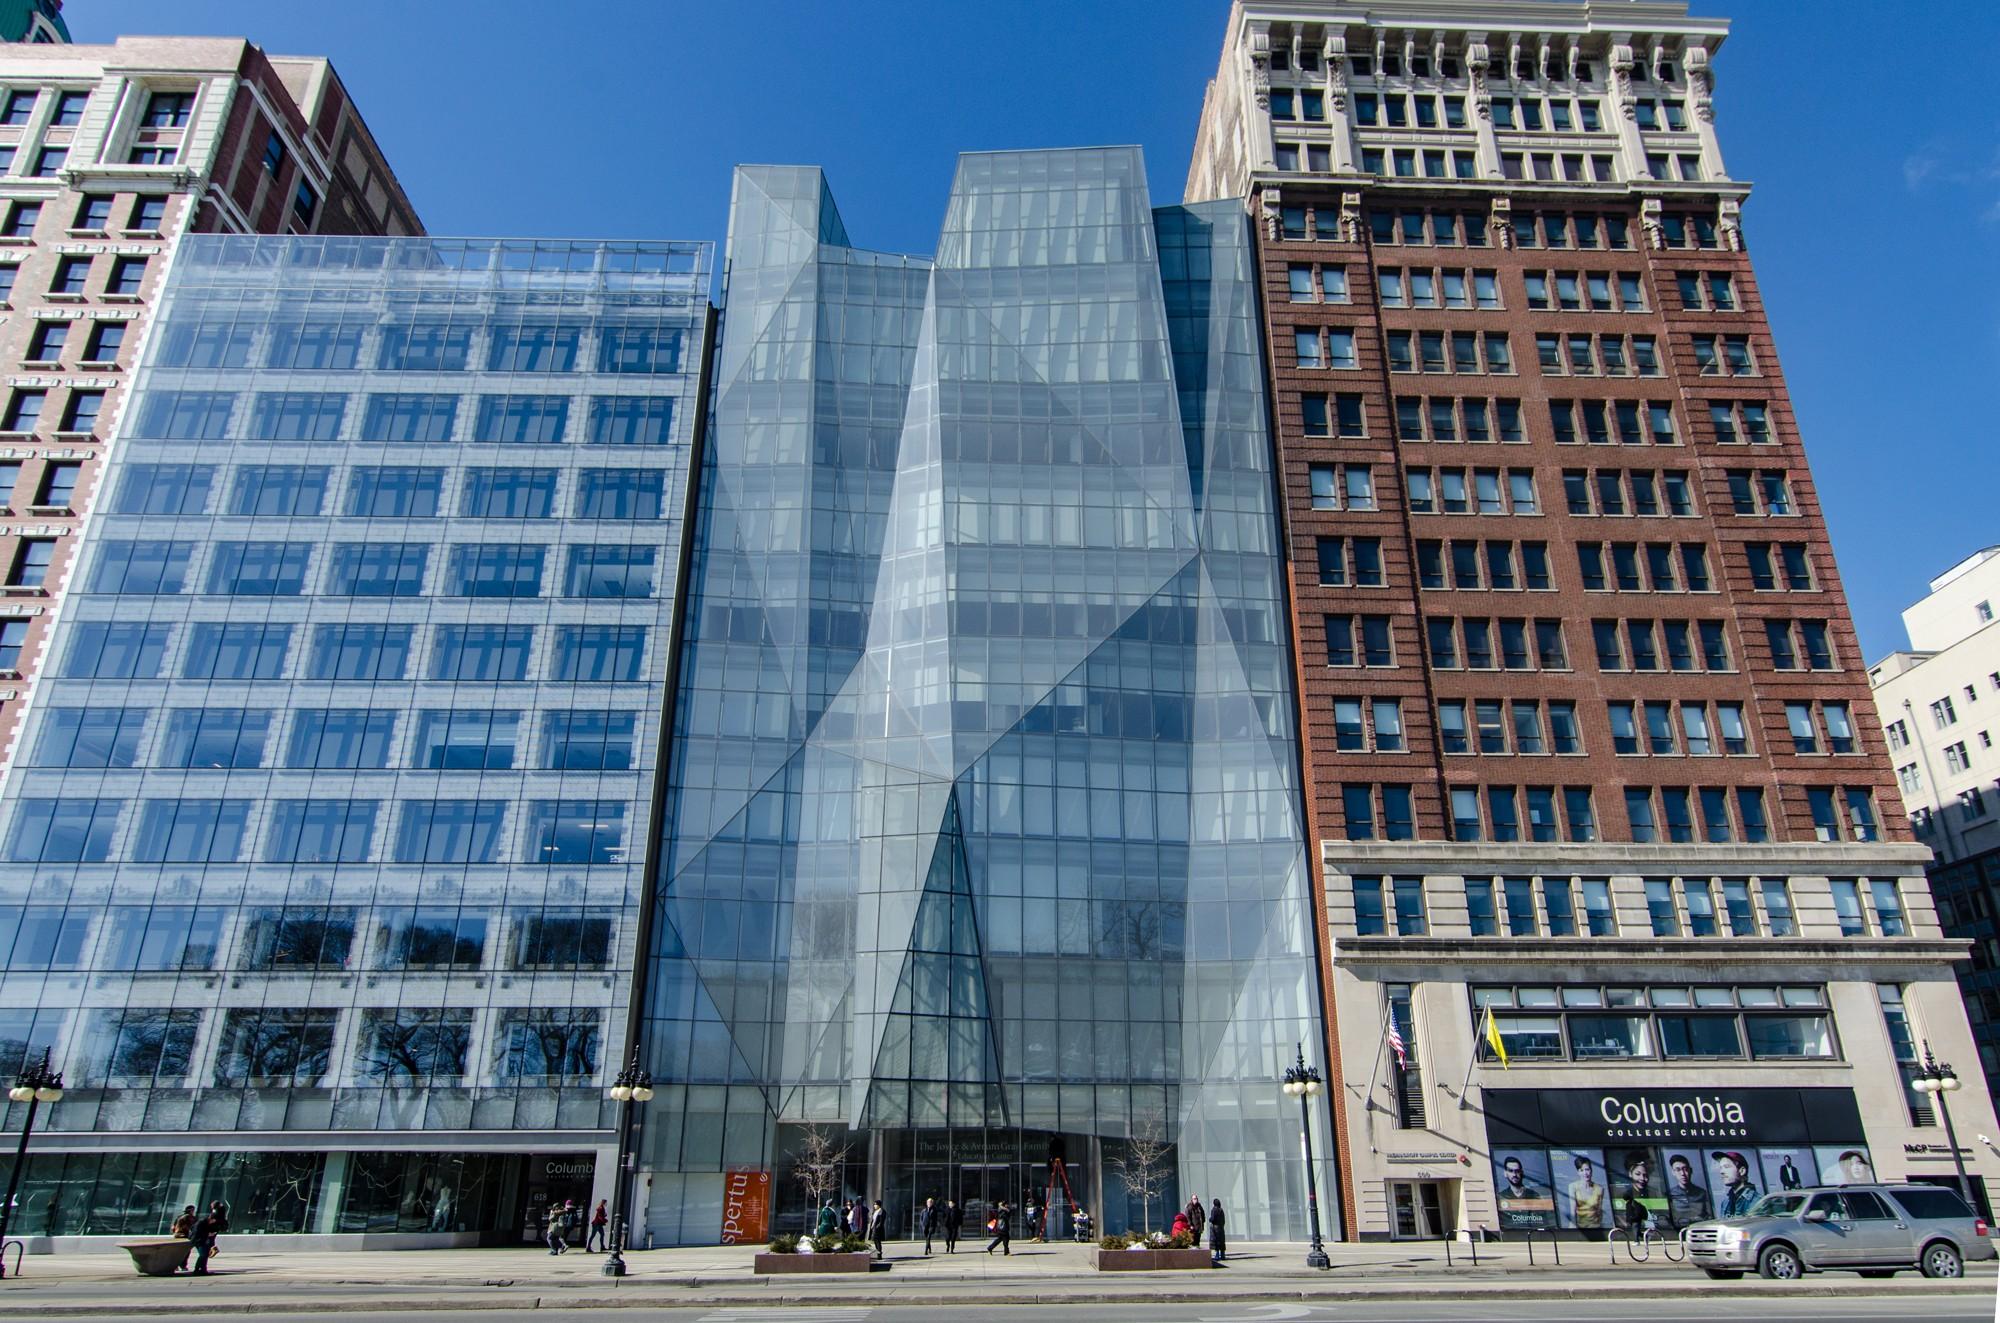 Spertus institute buildings of chicago chicago architecture center cac for Michigan design center home tour